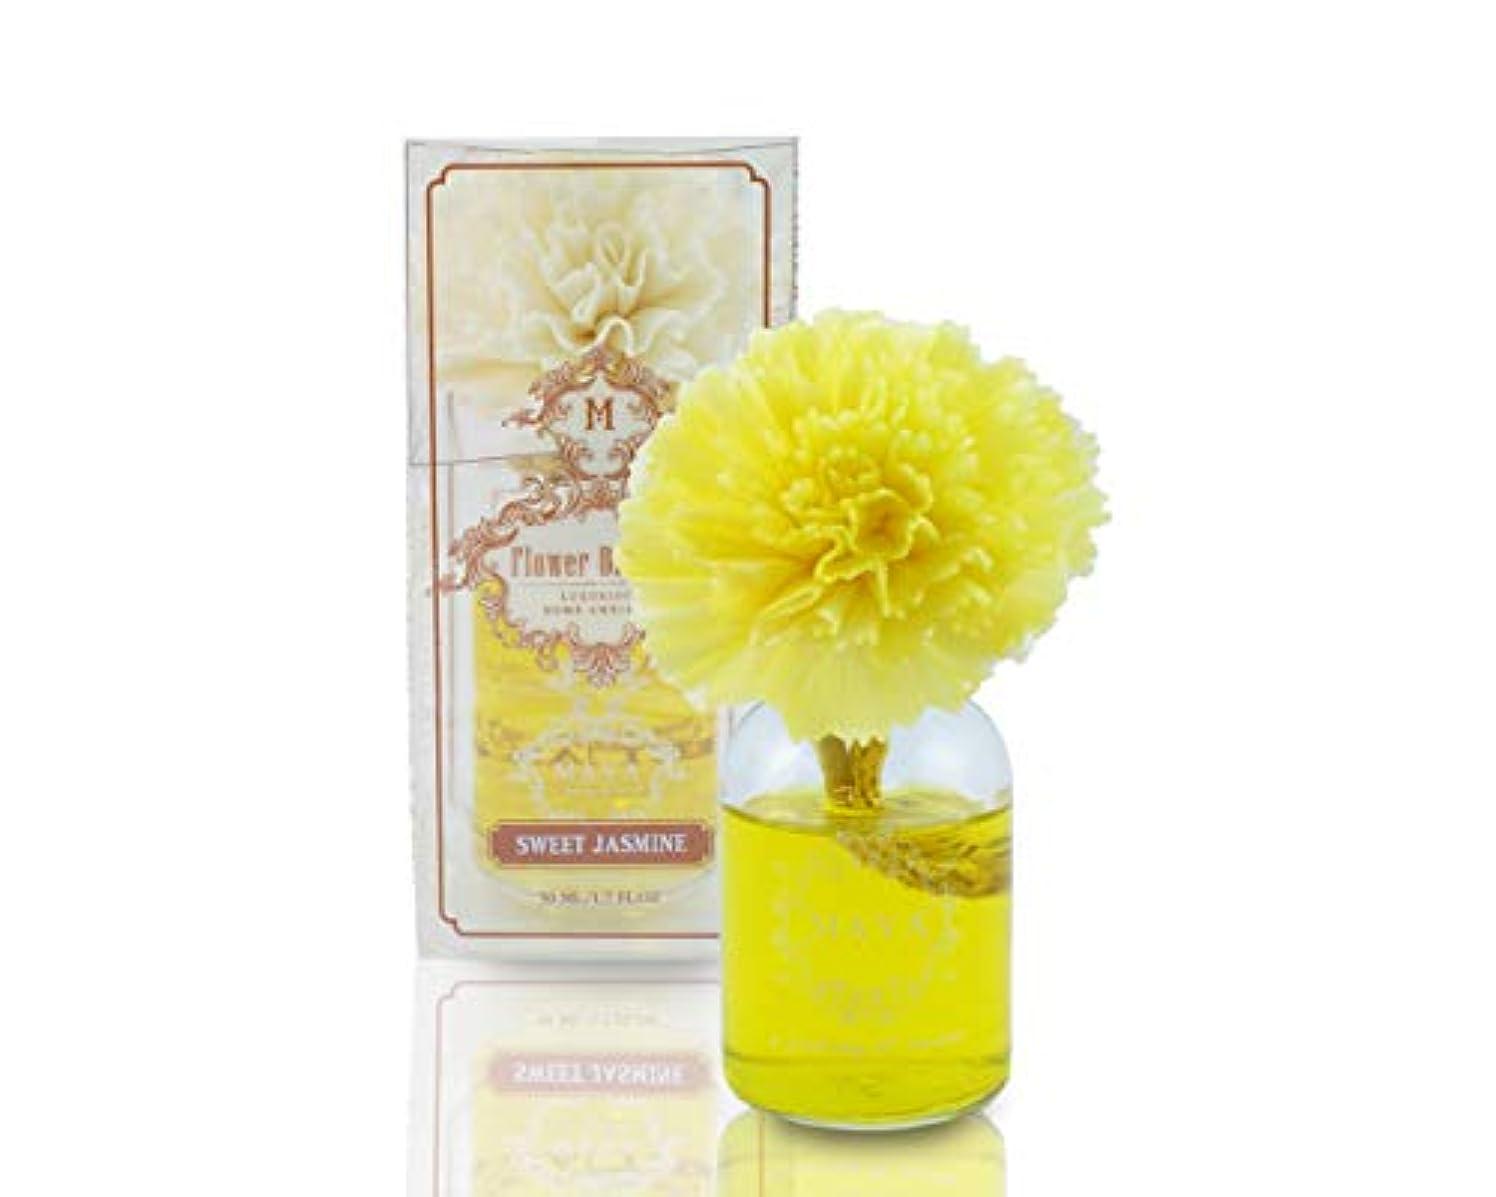 MAYA フラワーディフューザー スイートジャスミン 50ml 日本限定商品 |Aroma Flower Diffuser Sweet Jasmine 50ml [並行輸入品]